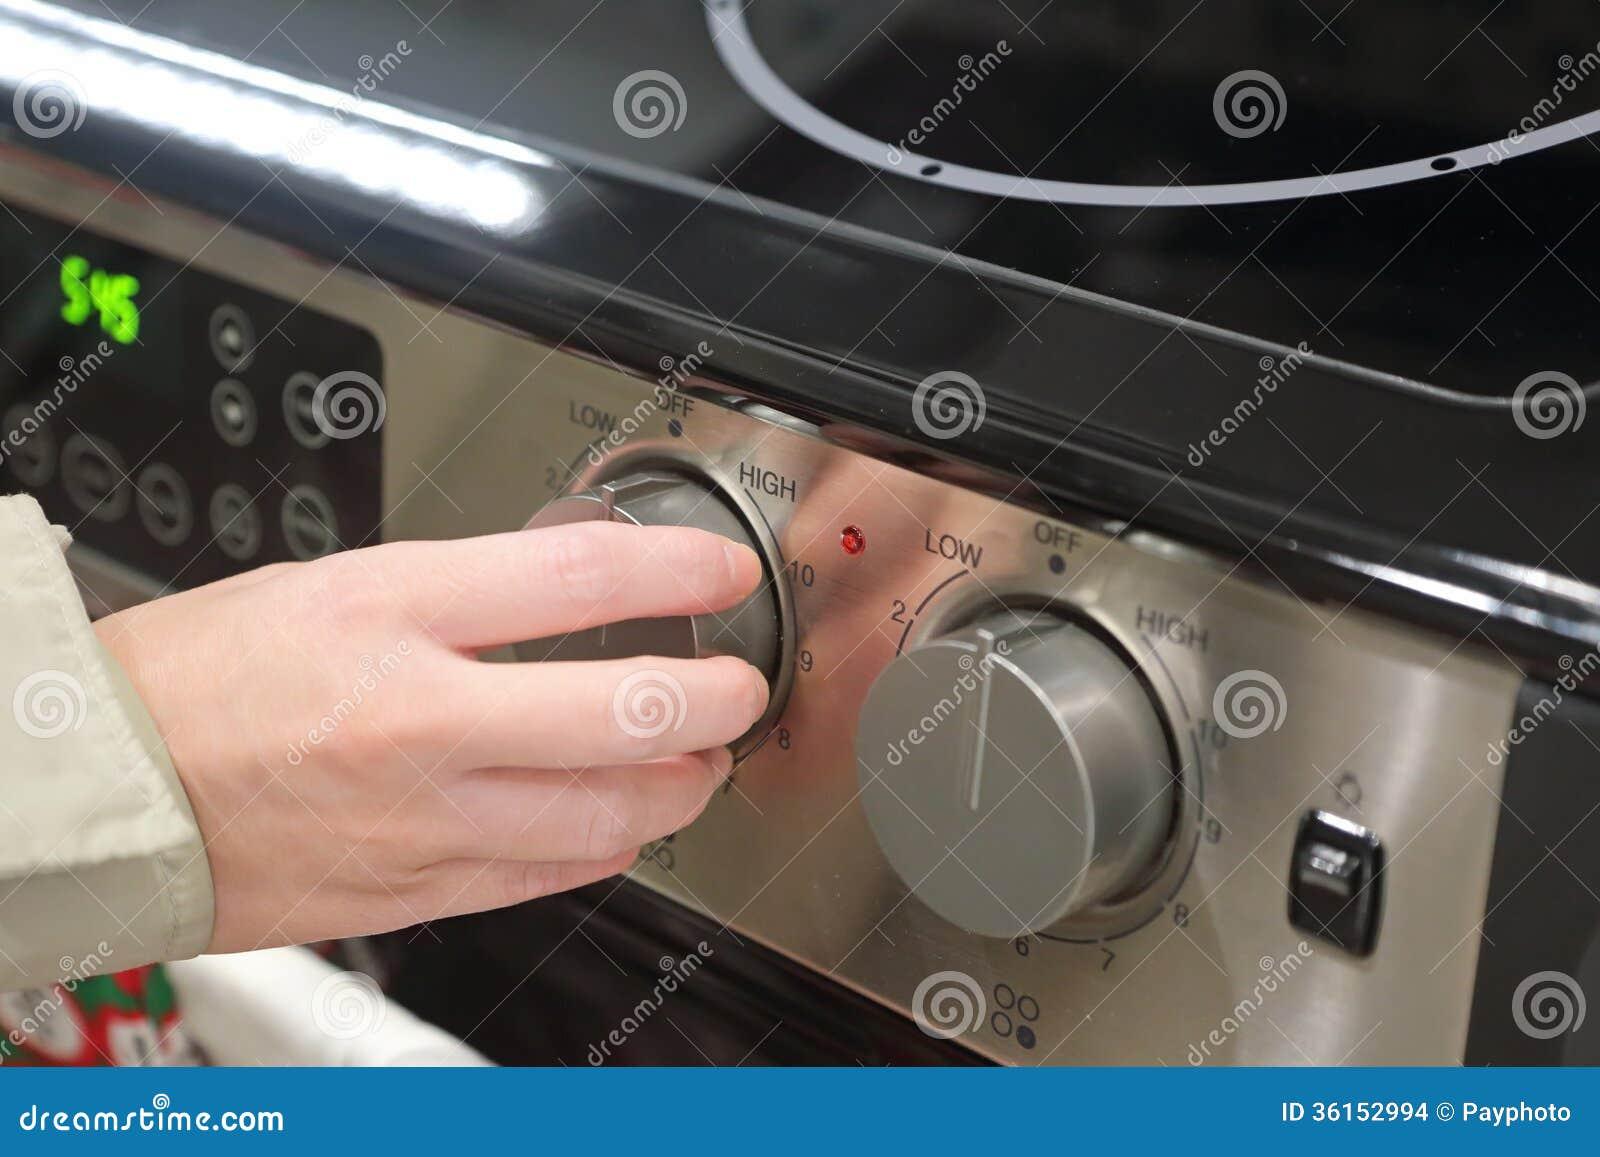 Using the Oven oven temperature control closeup. #8A6341